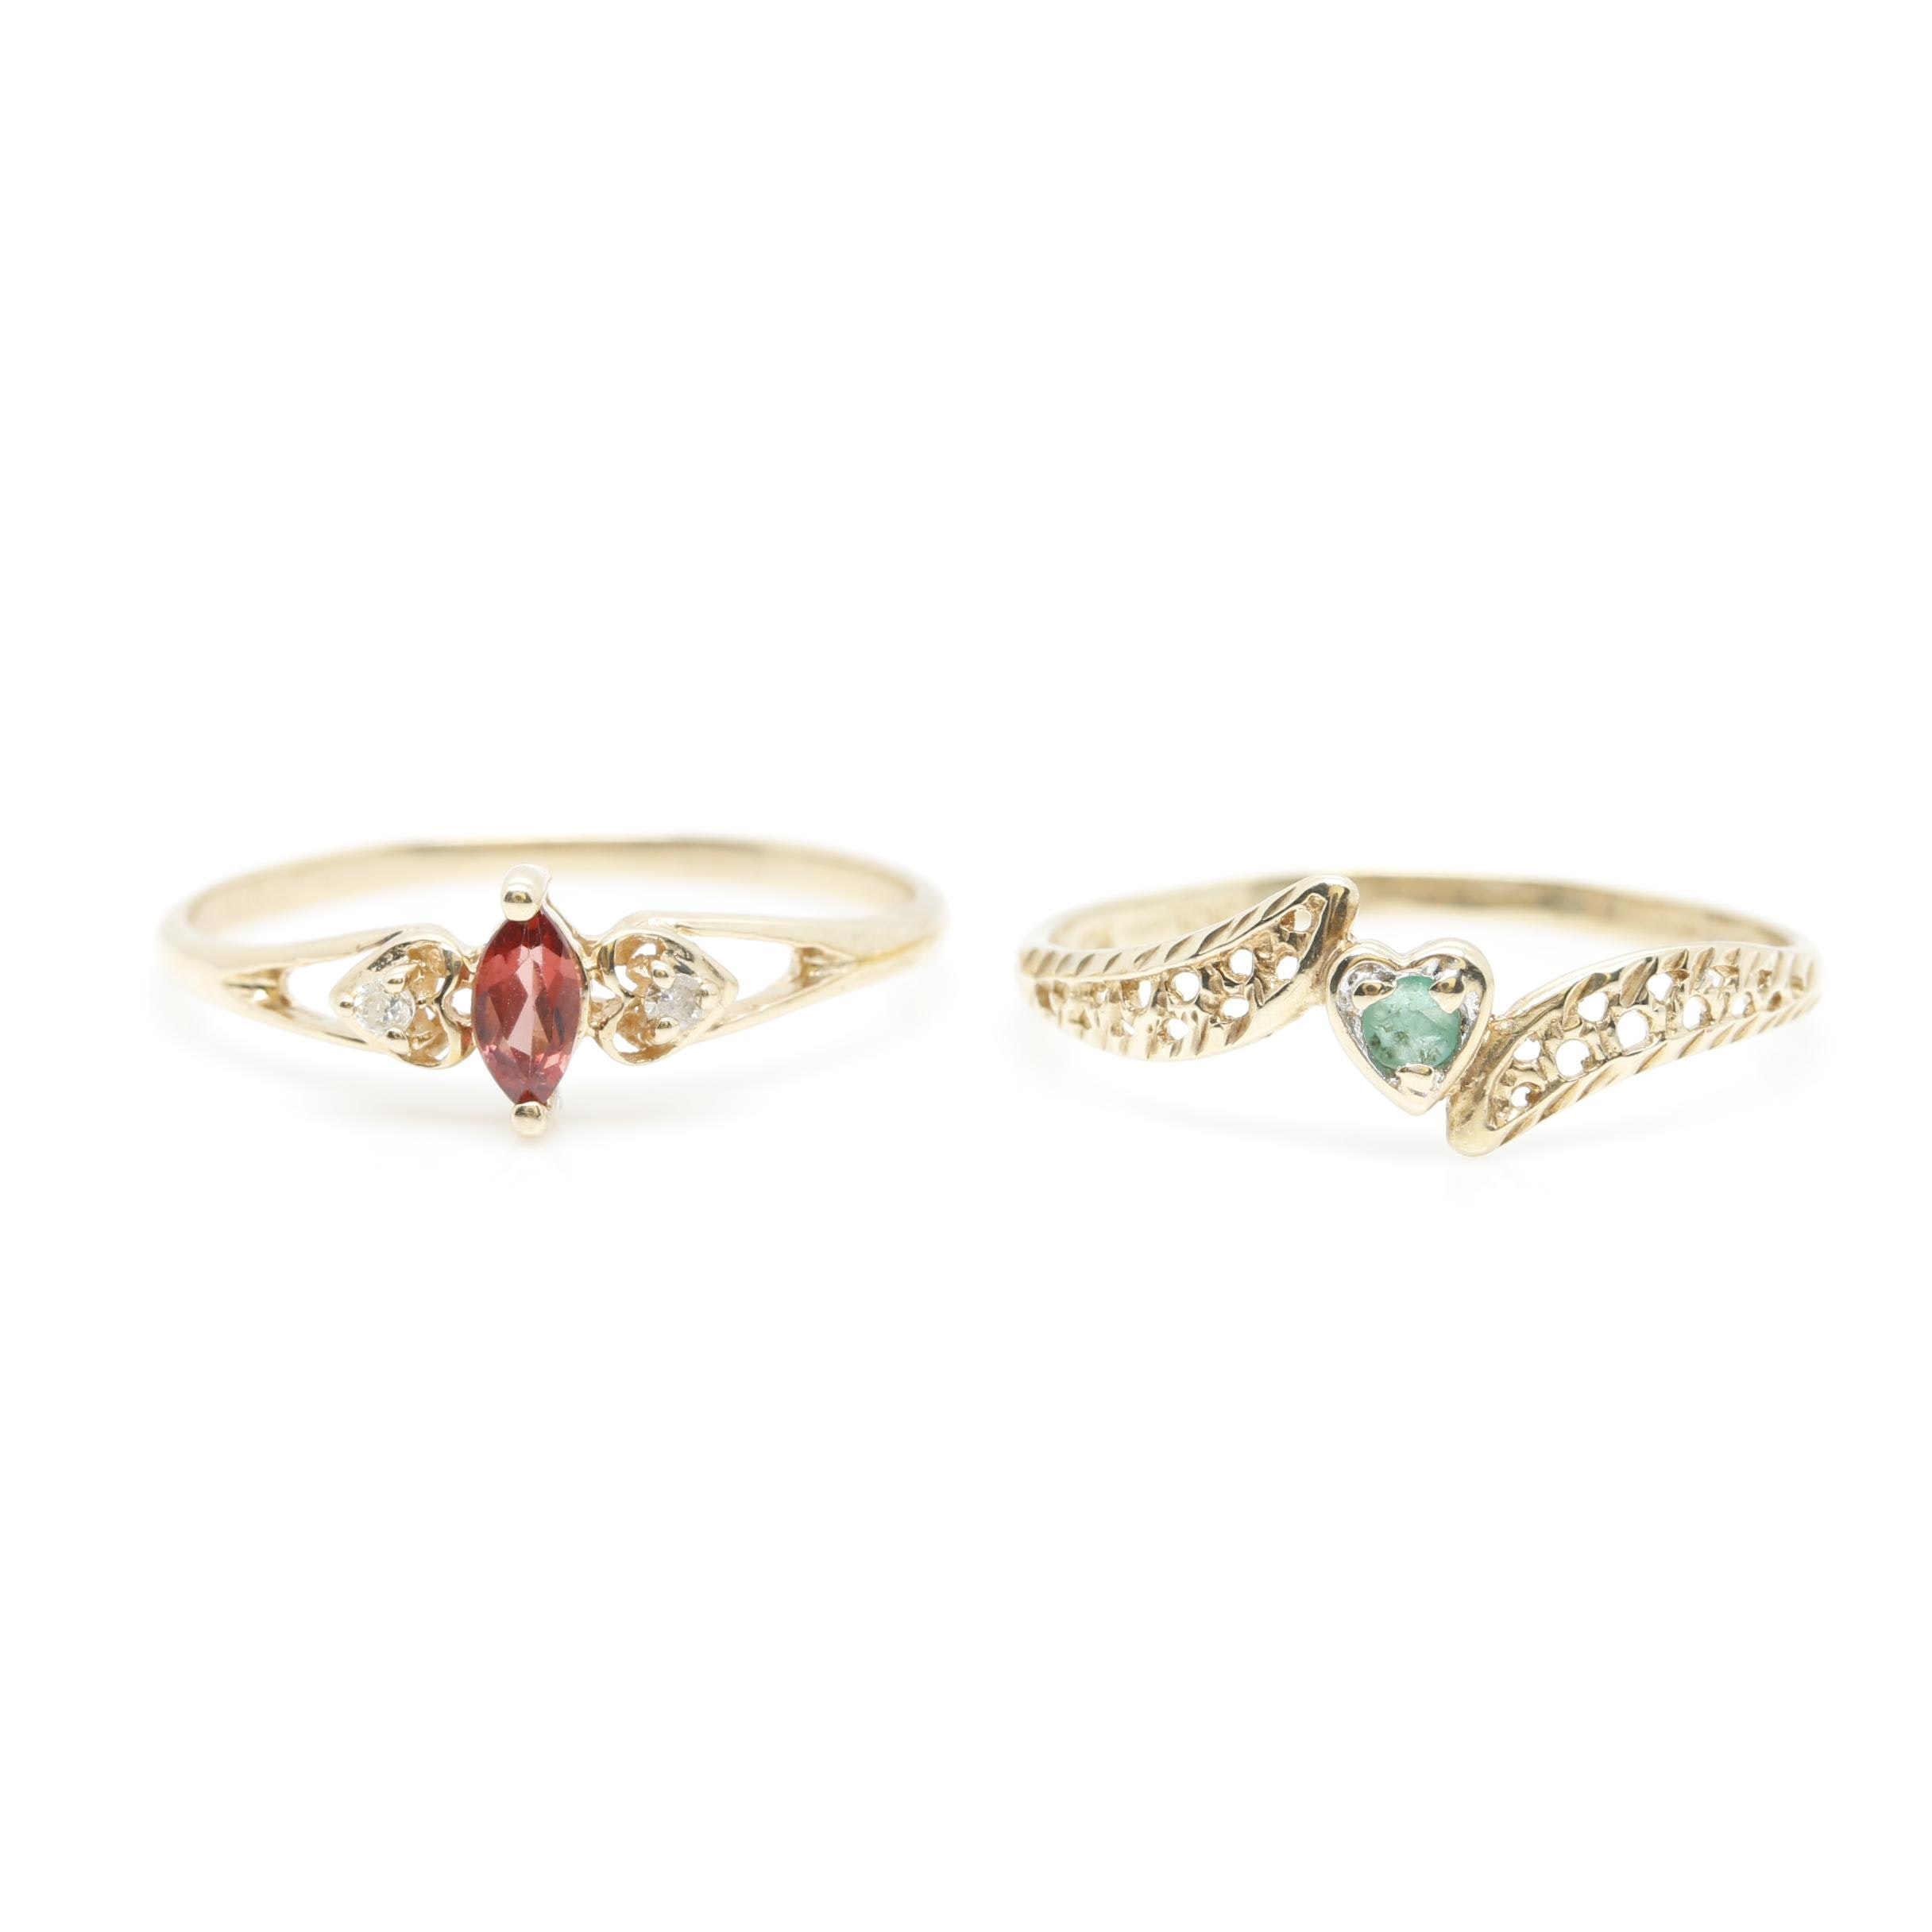 Pair of 10K Yellow Gold Emerald, Garnet and Diamond Rings